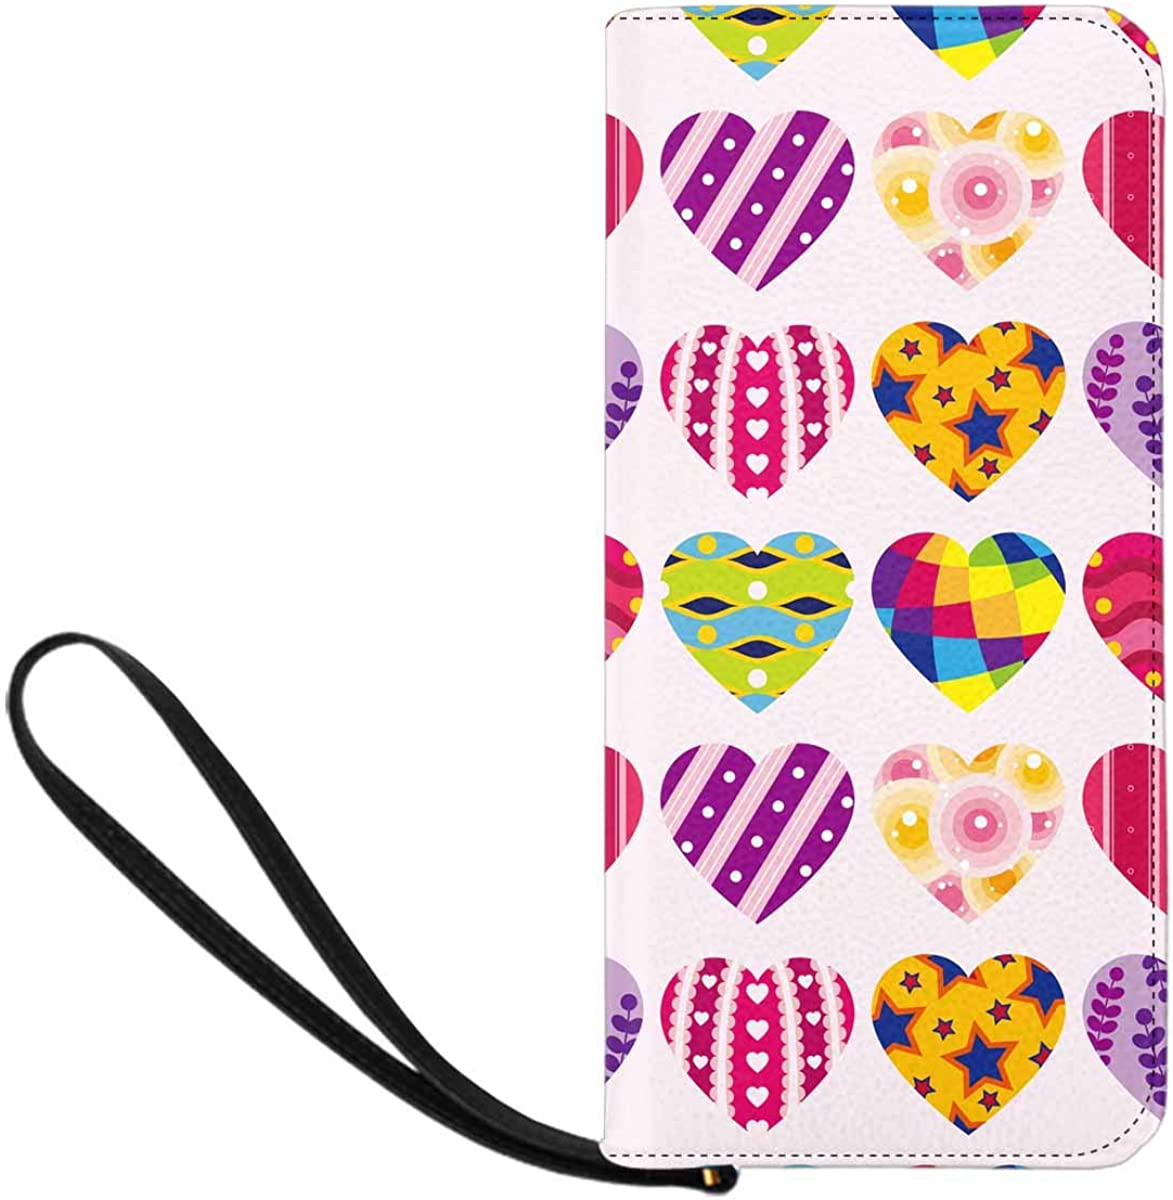 INTERESTPRINT Colorful Love Heart Clutch Wallet Handbag for Party Wedding